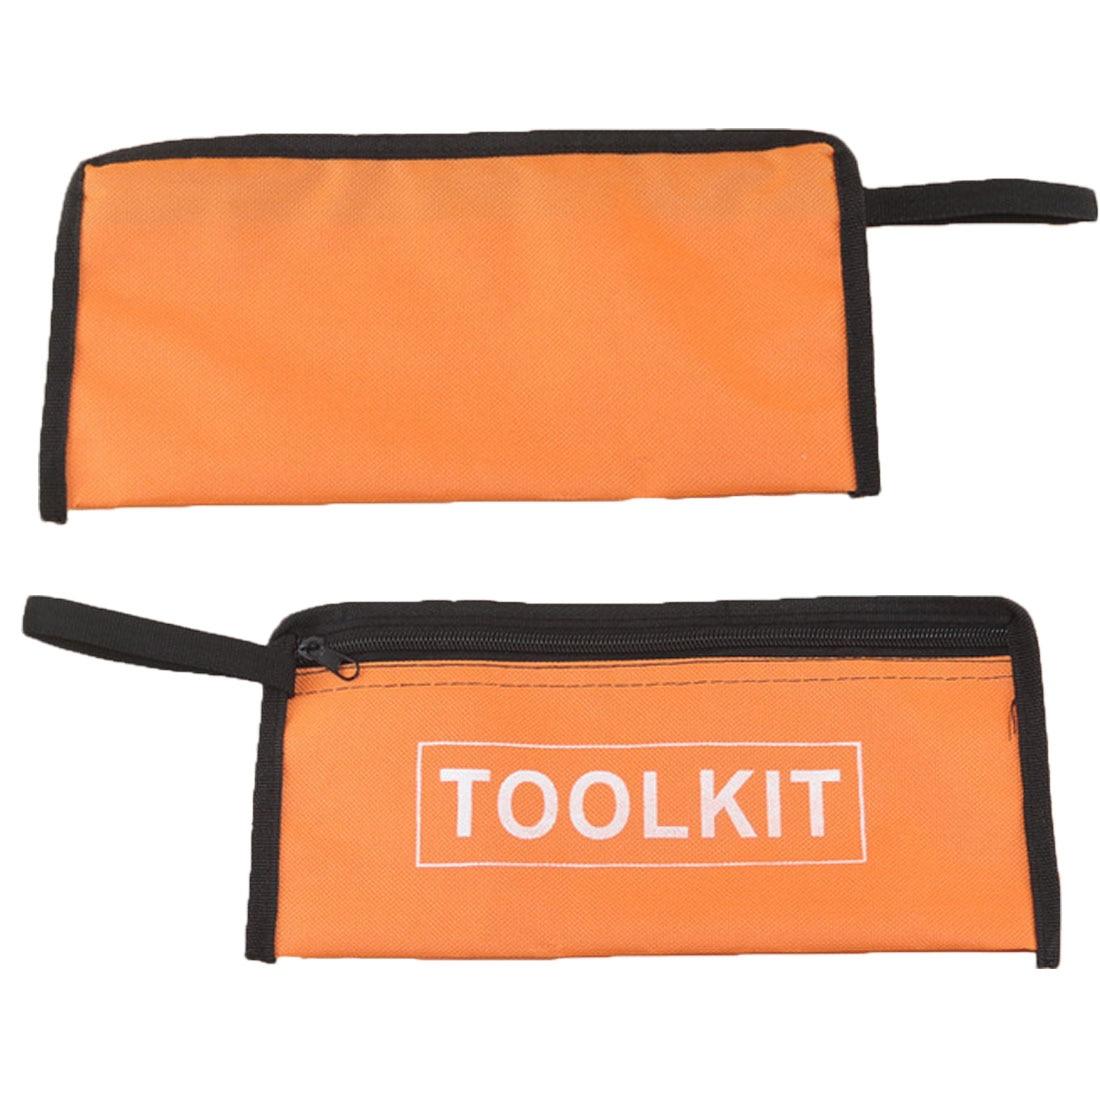 New Hardware Tool Toolkit Storage Bag Oxford Handy Zip Pouch Handbag Waterproof